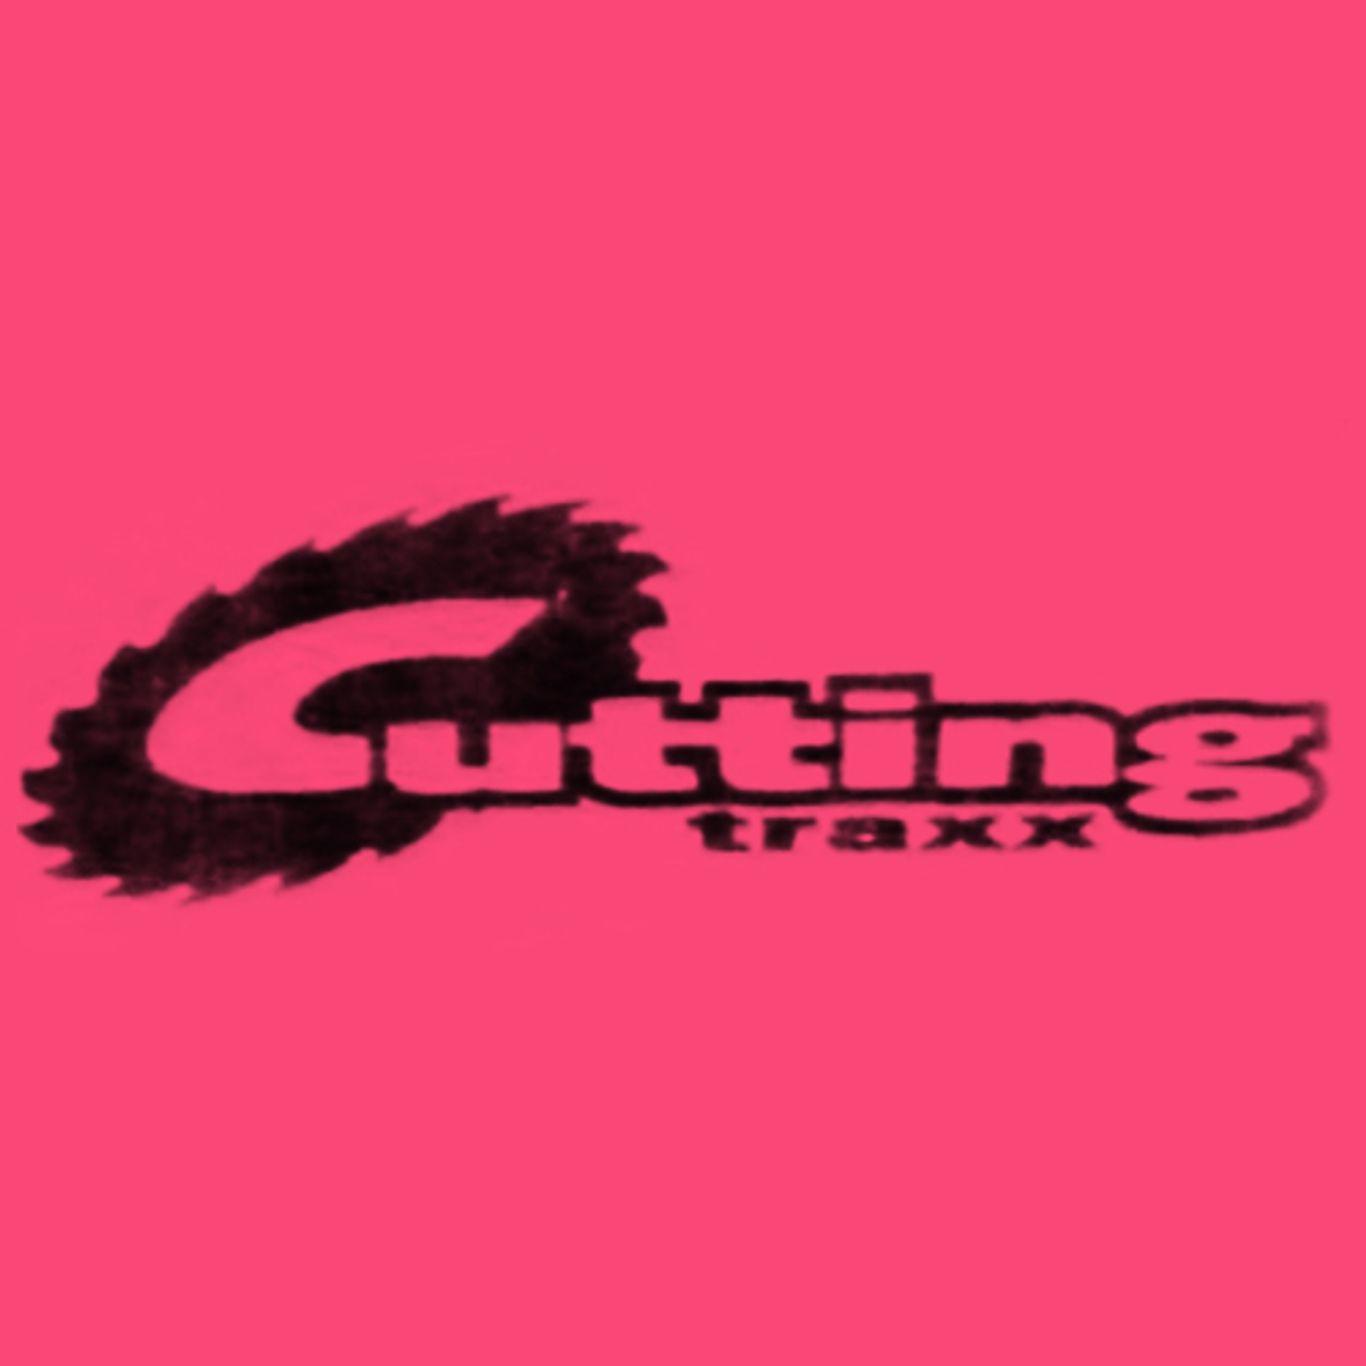 Cutting Traxx